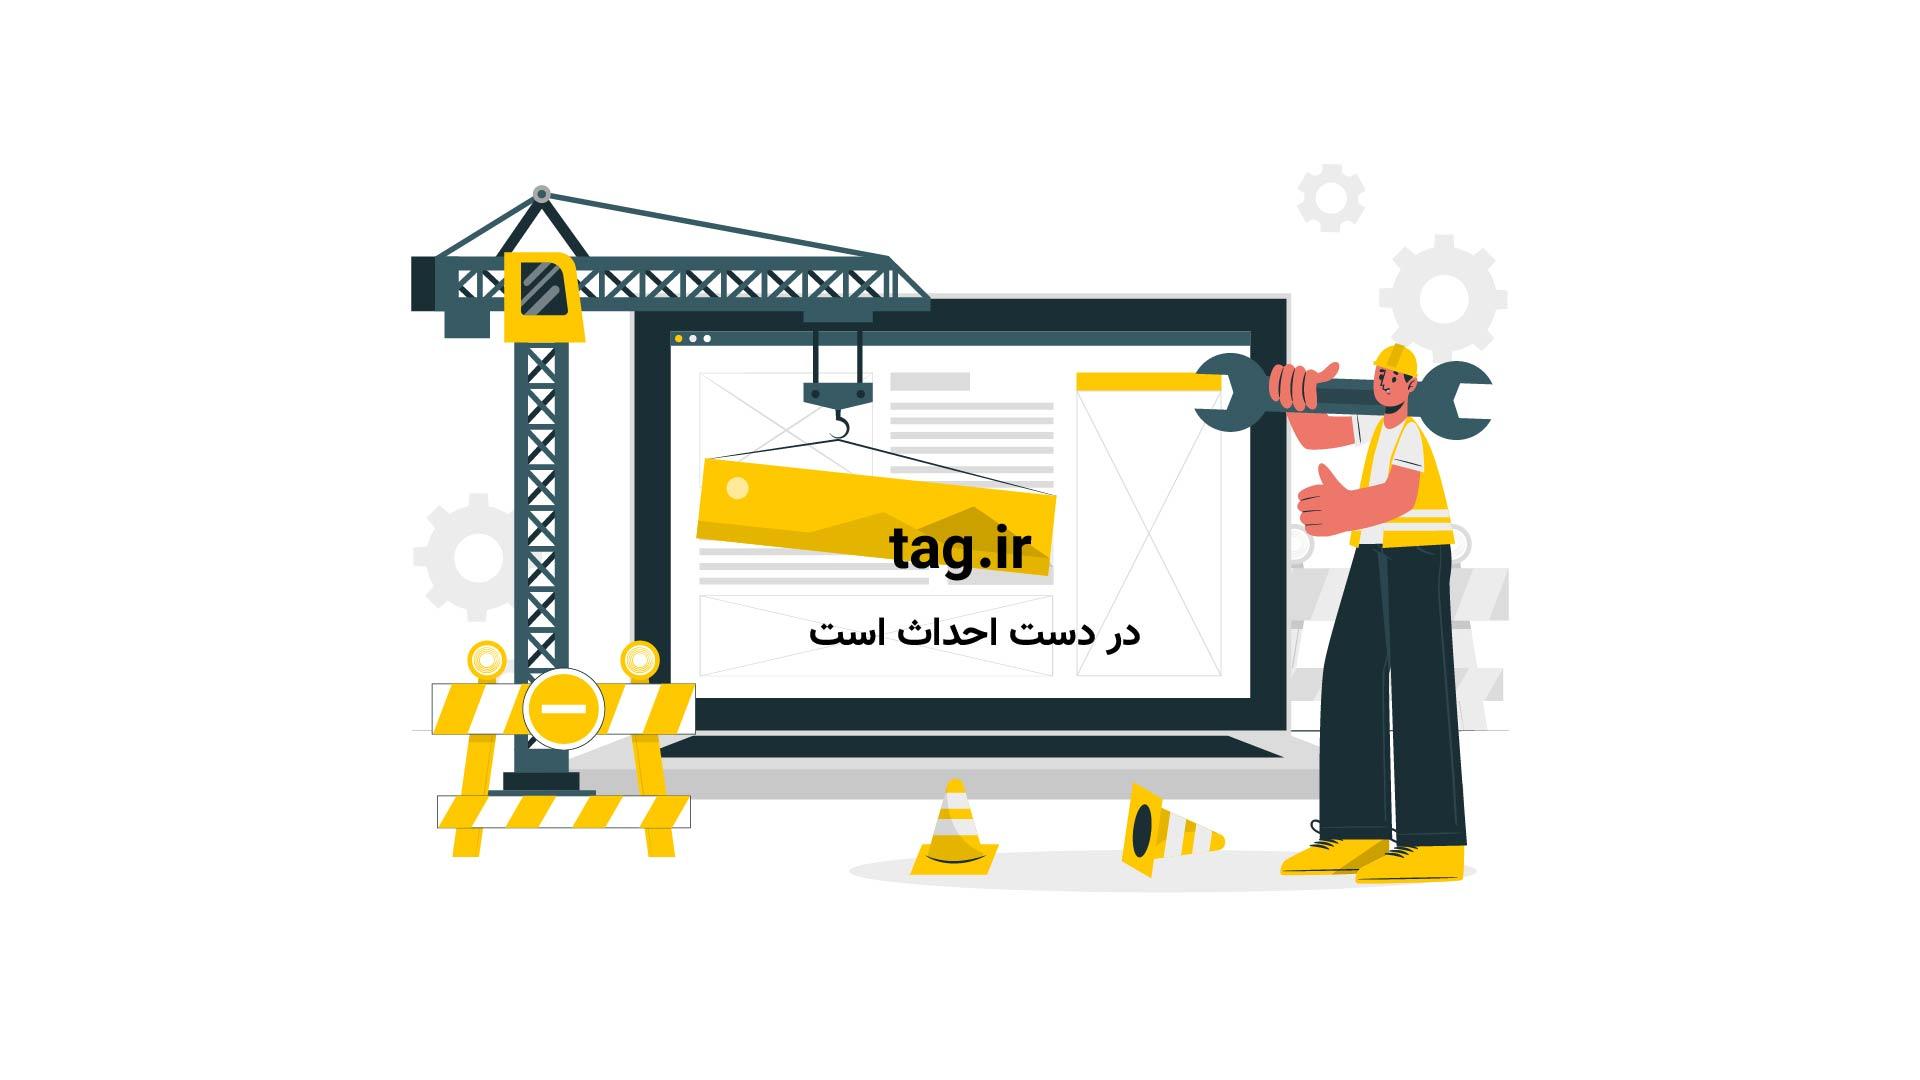 هک سایت دولتی عربستان